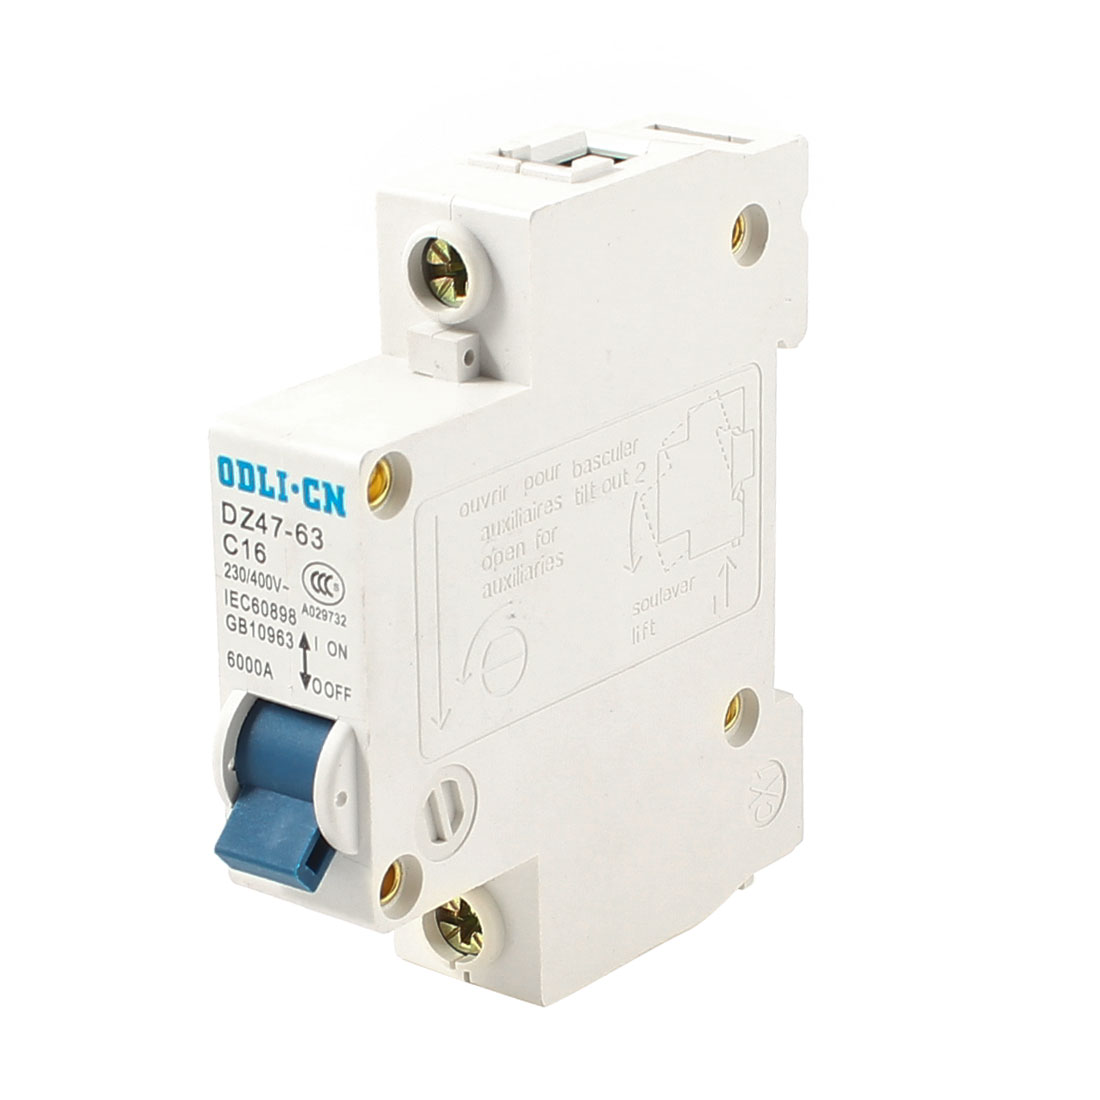 35mm DIN Rail Mounted Single Pole Miniature Circuit Breaker AC 230/400V 16A